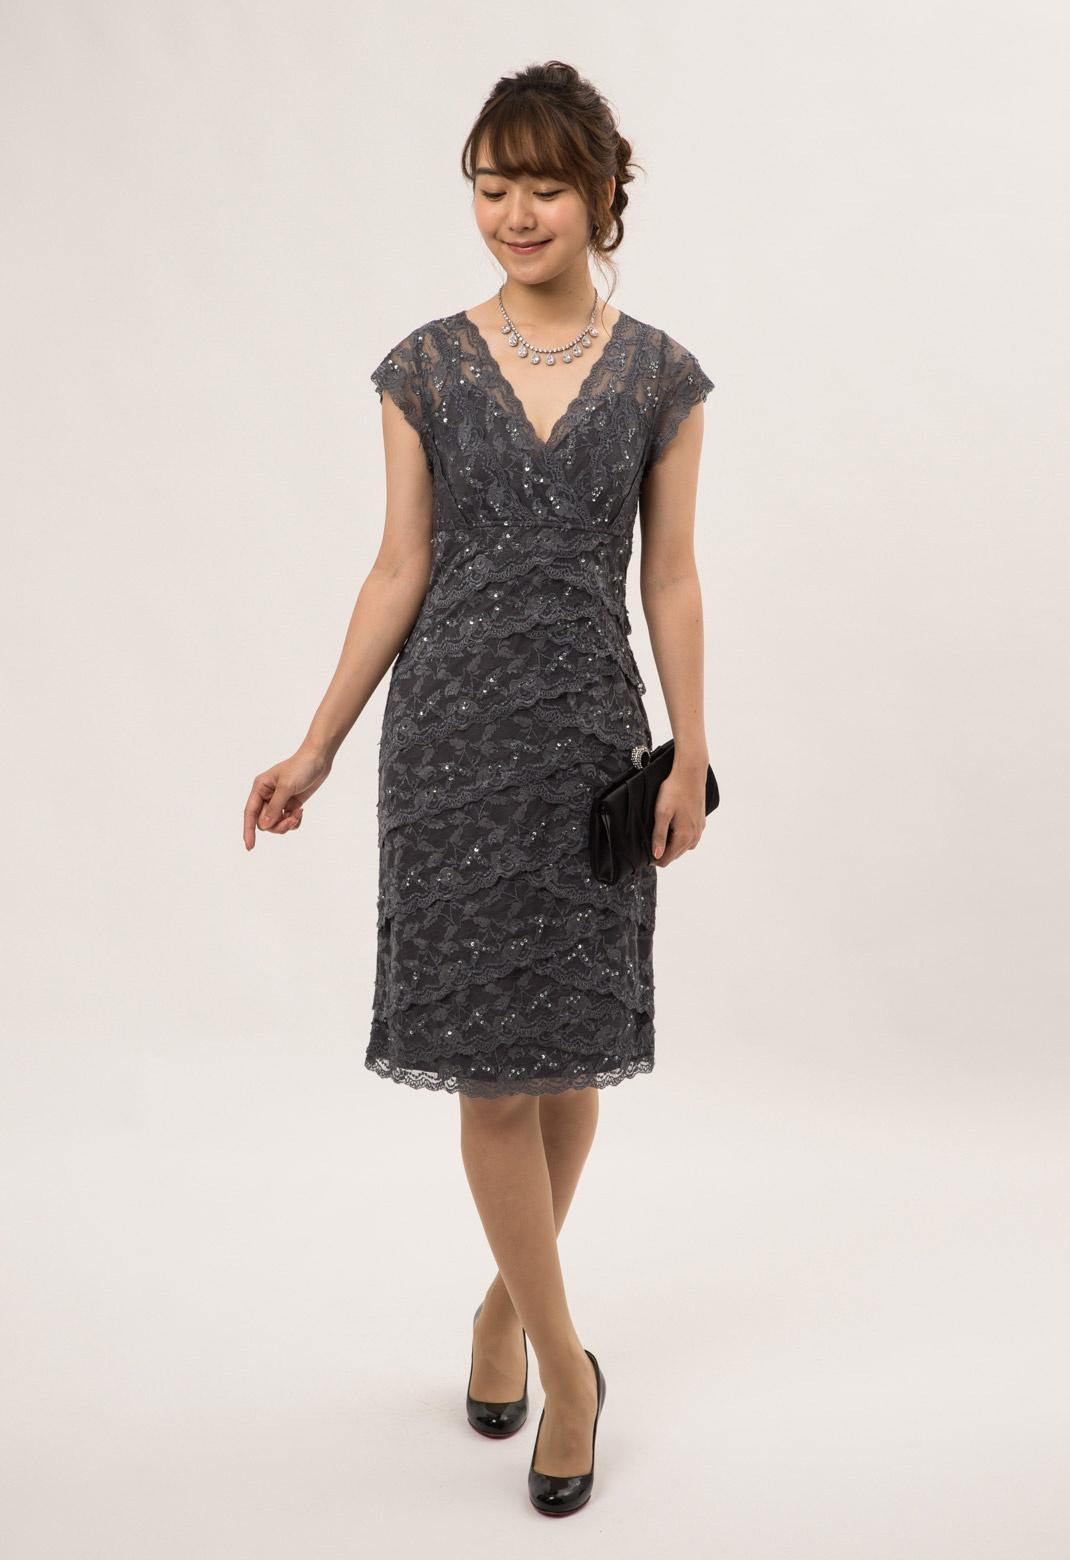 MARINA スパンコール×レース 半袖 ドレス